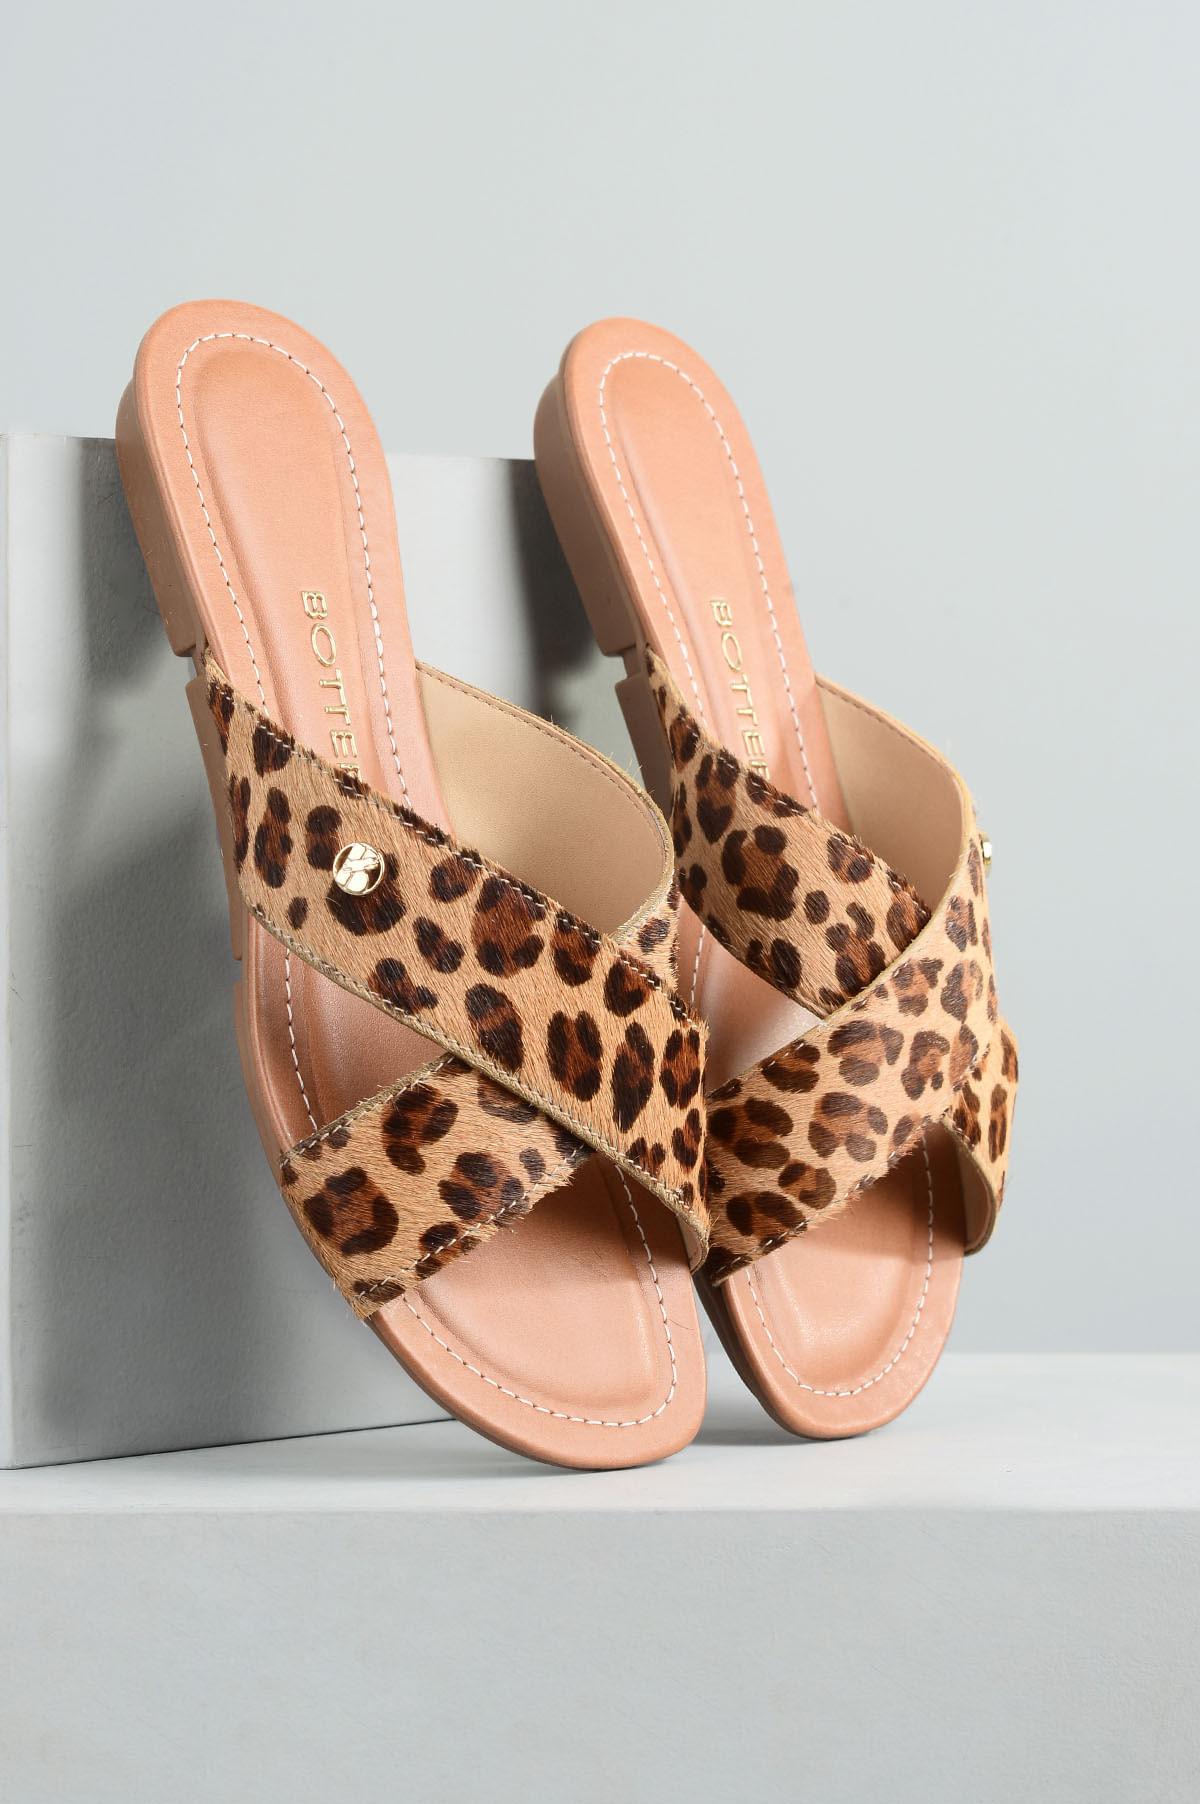 8bf64379b9 Chinelo Feminino Lorey Bottero PELO - ONCA - Mundial Calçados